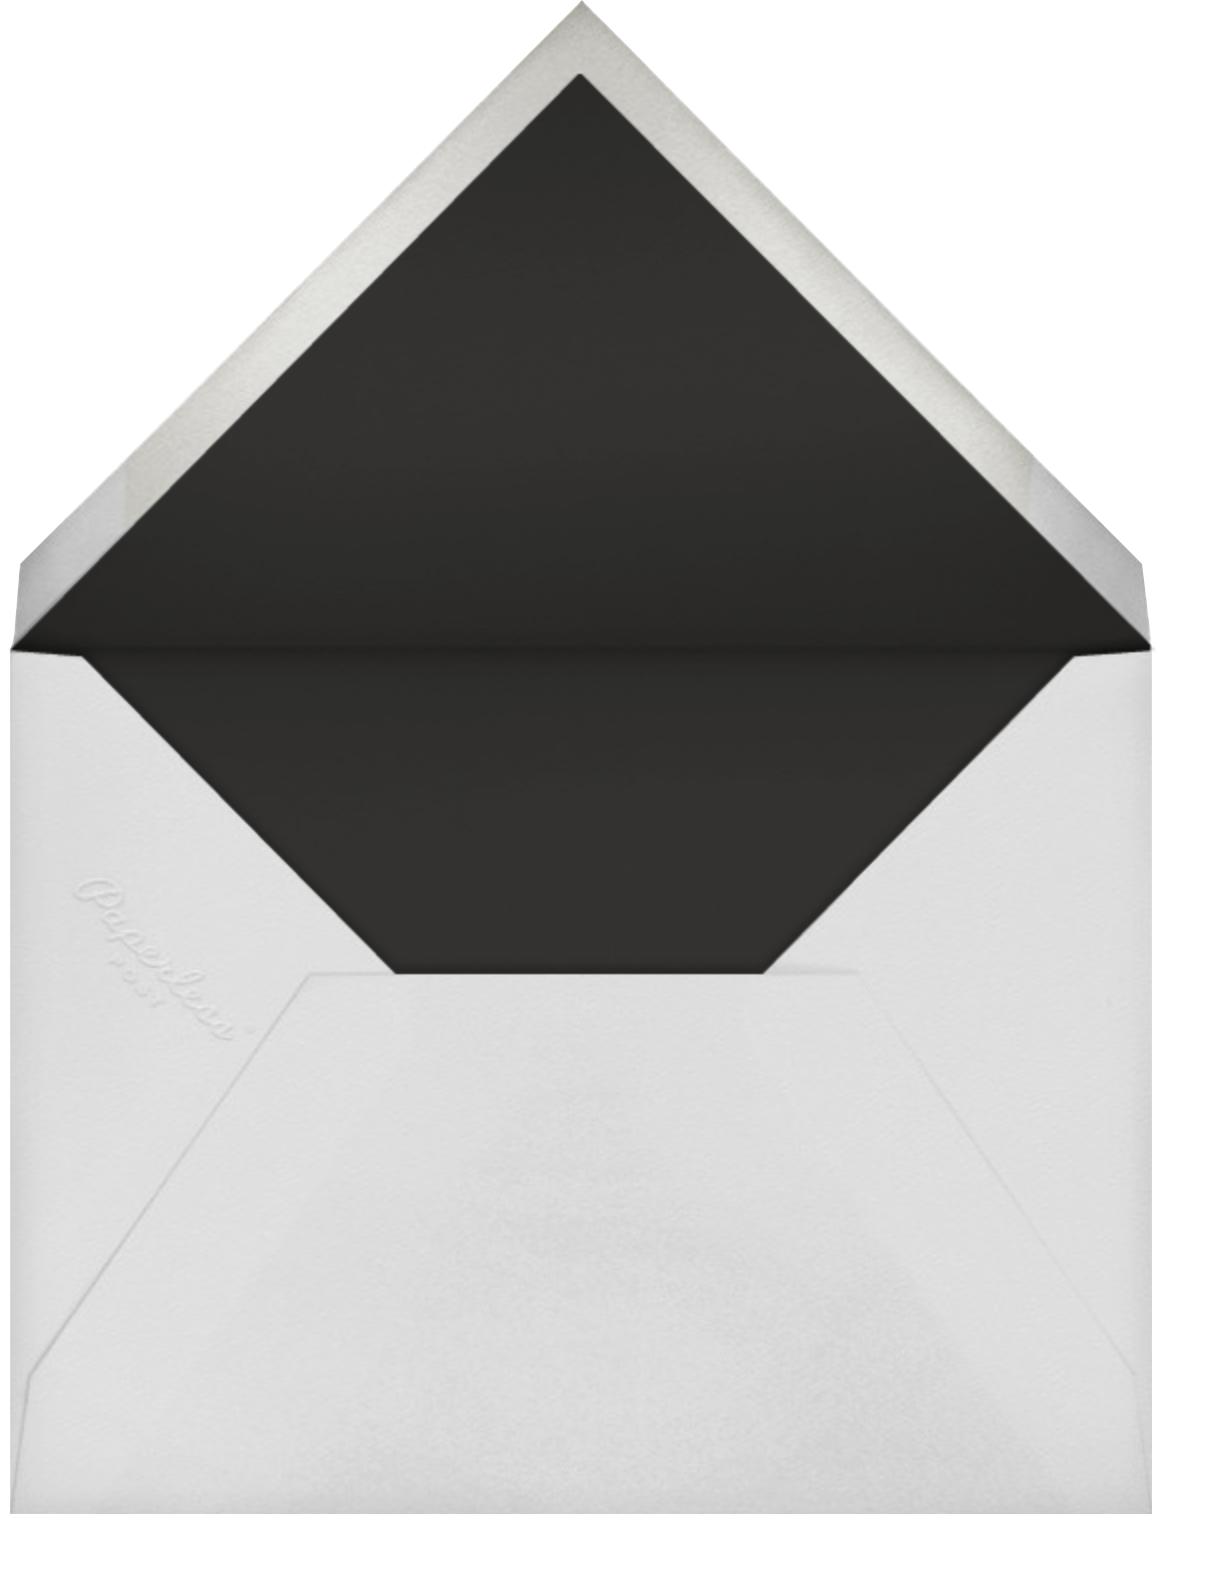 Ligature (Stationery) - Taupe - Vera Wang - Personalized stationery - envelope back